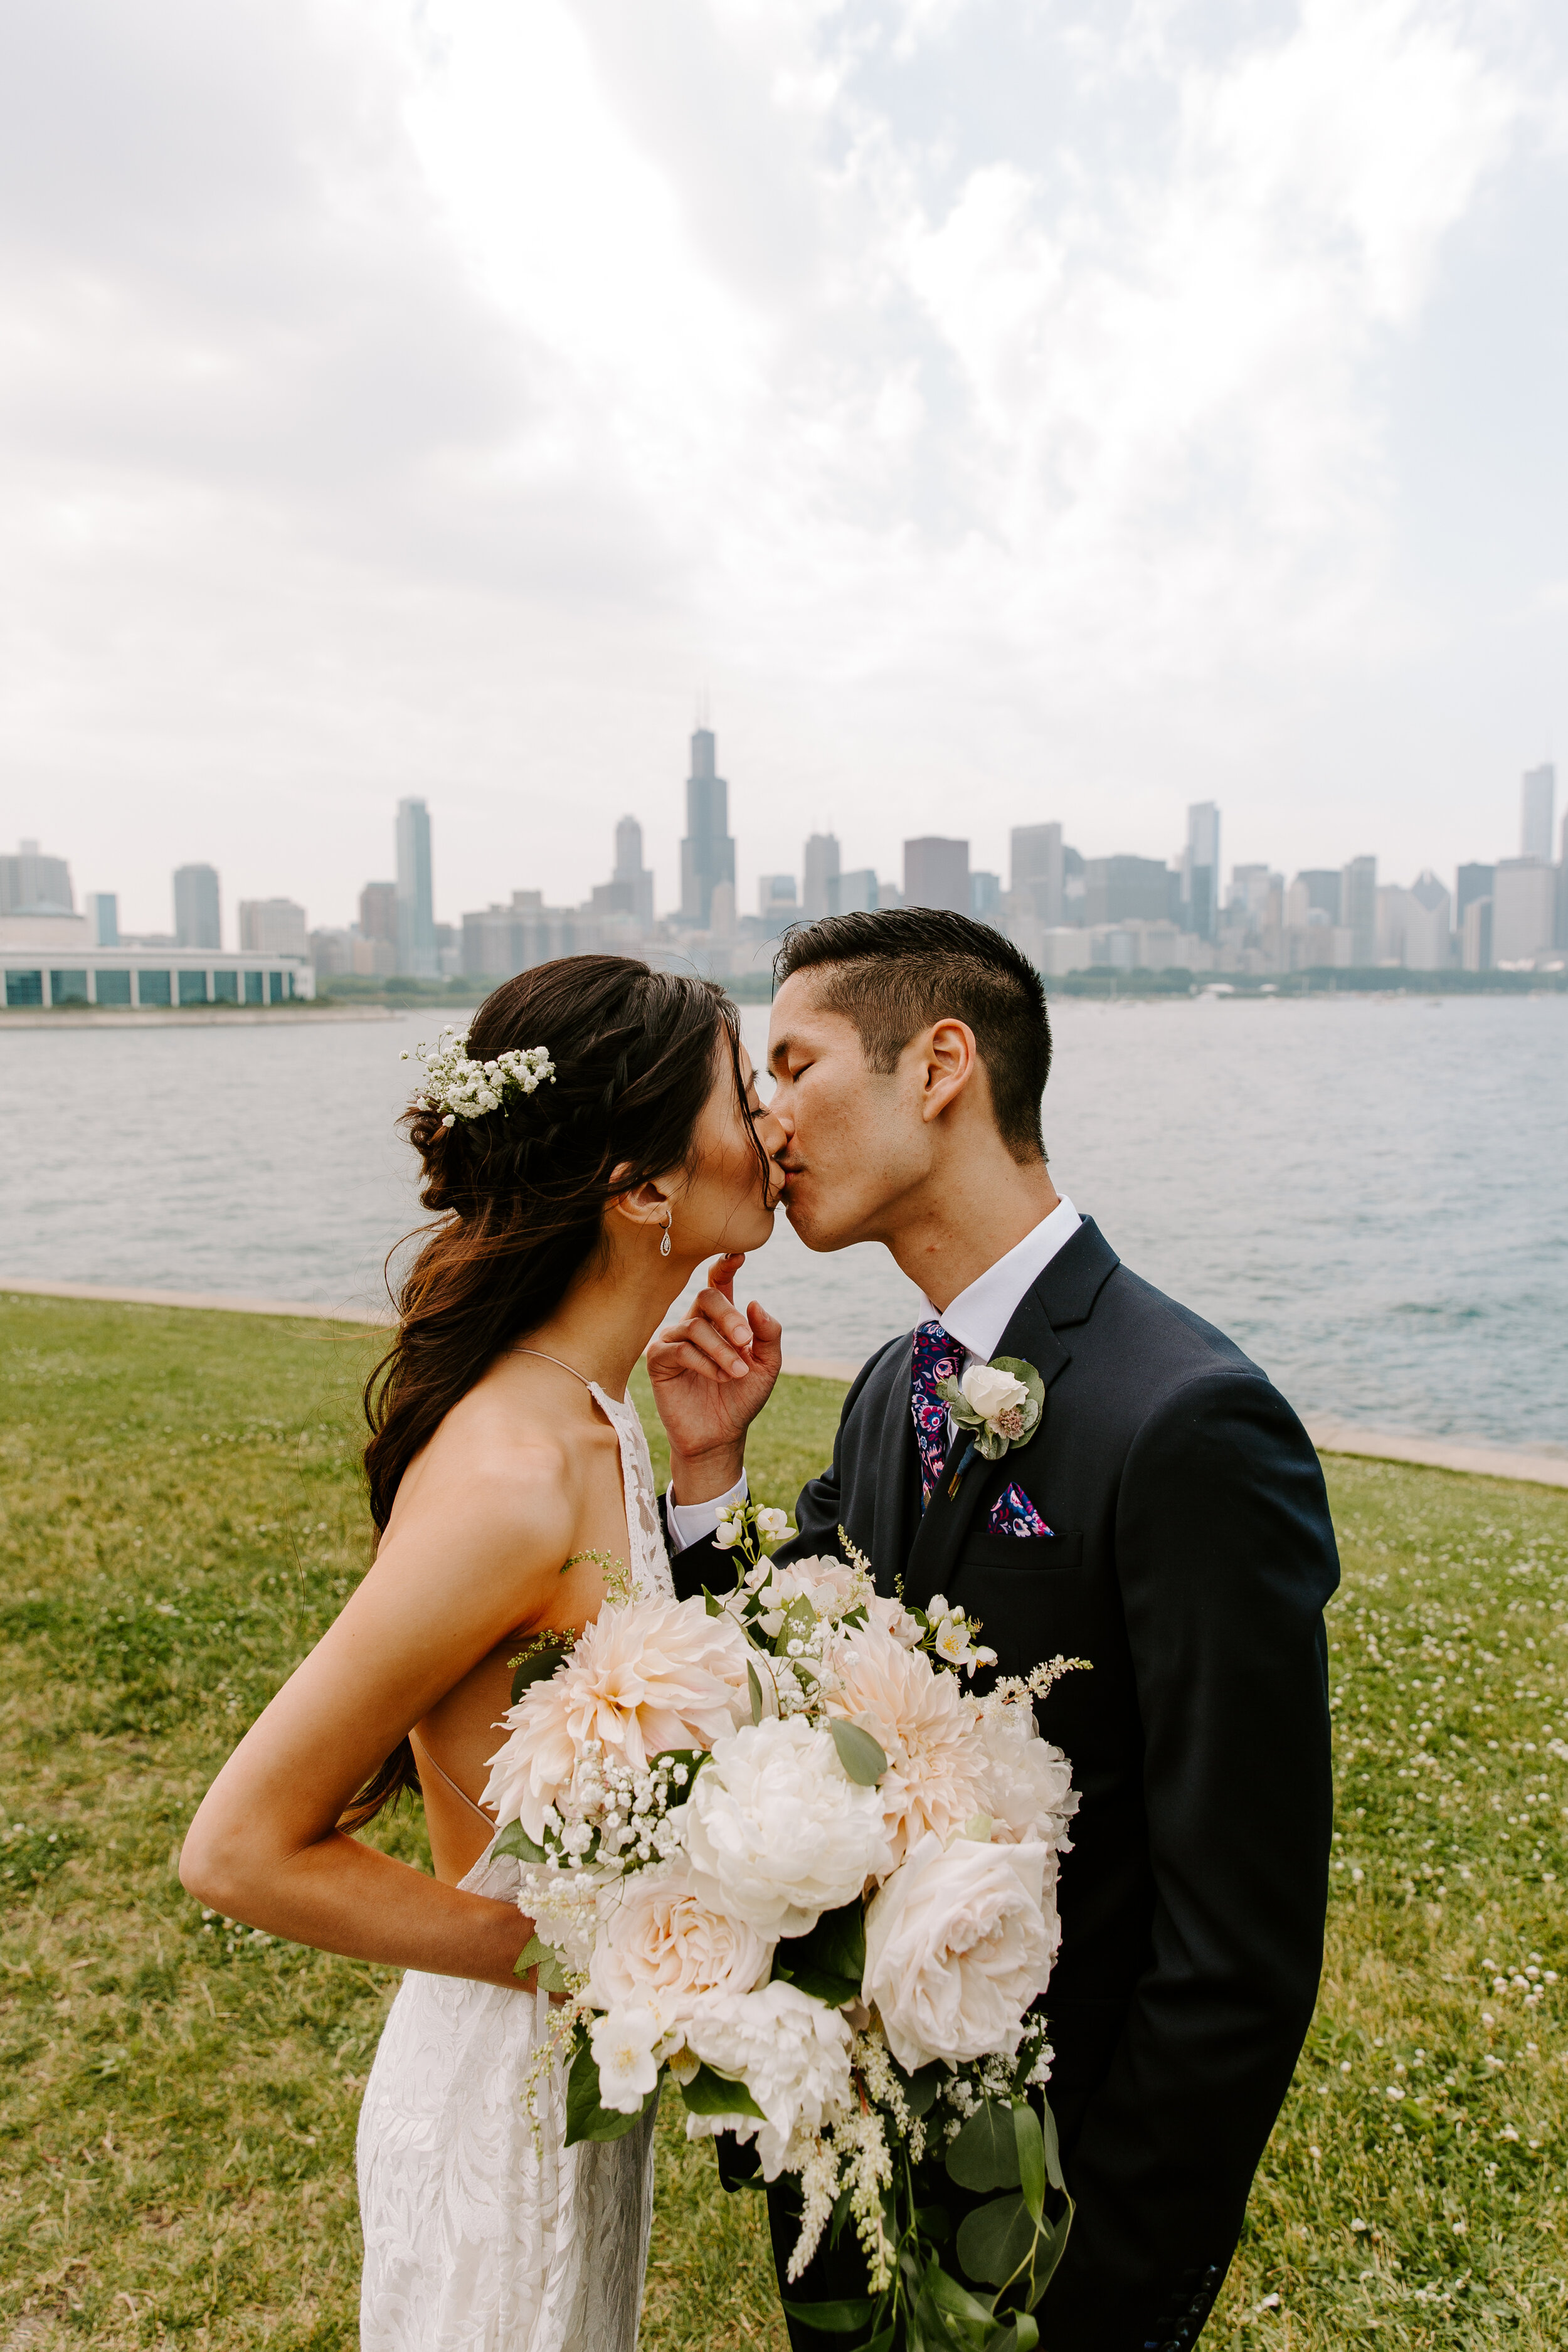 quan wedding-100.jpg